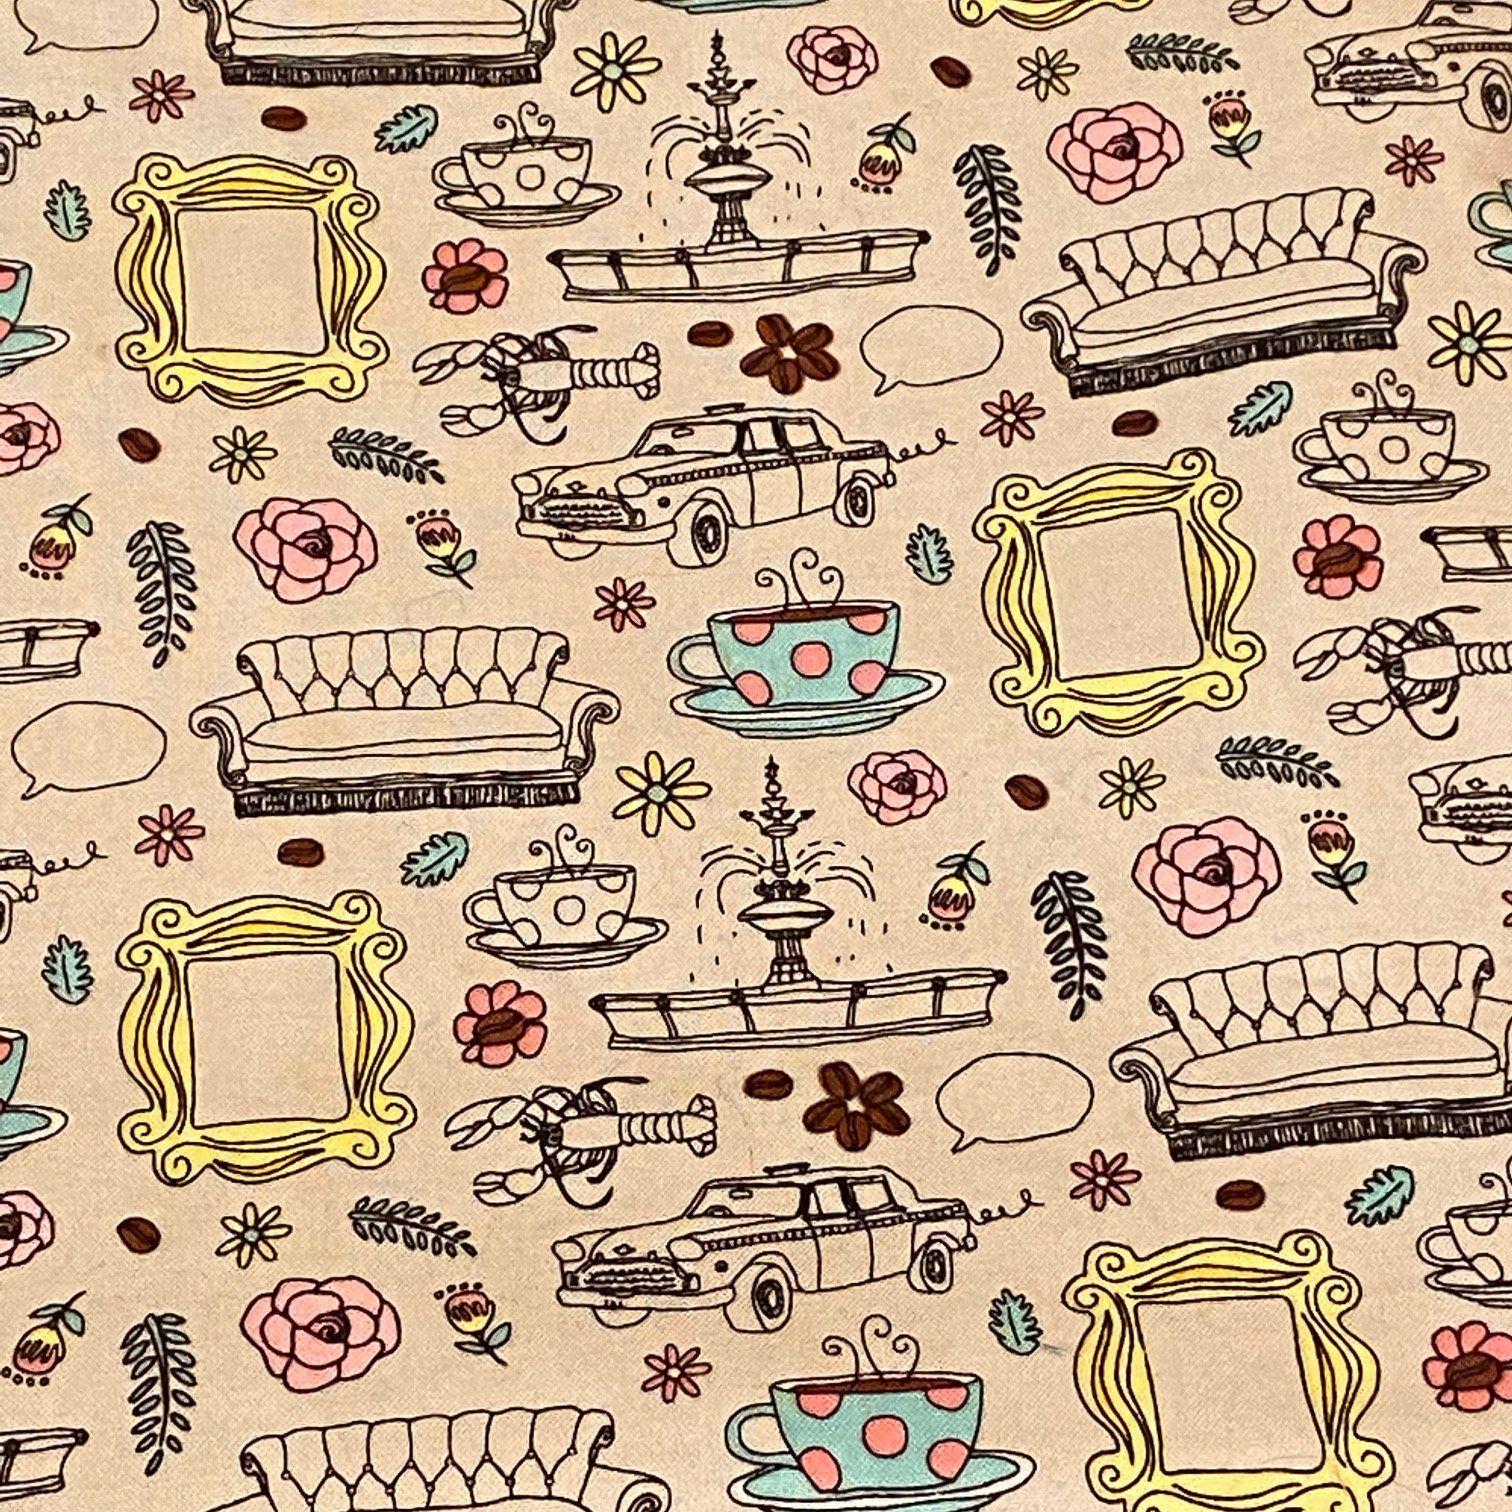 Crossbody Hipster Bag, Vintage Metropolitan Throwback, Kitschy MCM City Lifestyle, Handmade Medium Soft Cotton Ladies Purse, Free Shipping @thepeppysquid #midcenturymodernstyle #metrostylebag #handmadebags #cottonbag #handcraftedbags #everydaybag #crossbodybag #crossbodybags #bagsandpurses #bagloverscommunity #handbagsonline #hipsterbag #hipsterstyle #handmadeonetsy #discoveretsy #etsymaker #lovehandmade #handcraftedgifts #etsymakers #etsyusa